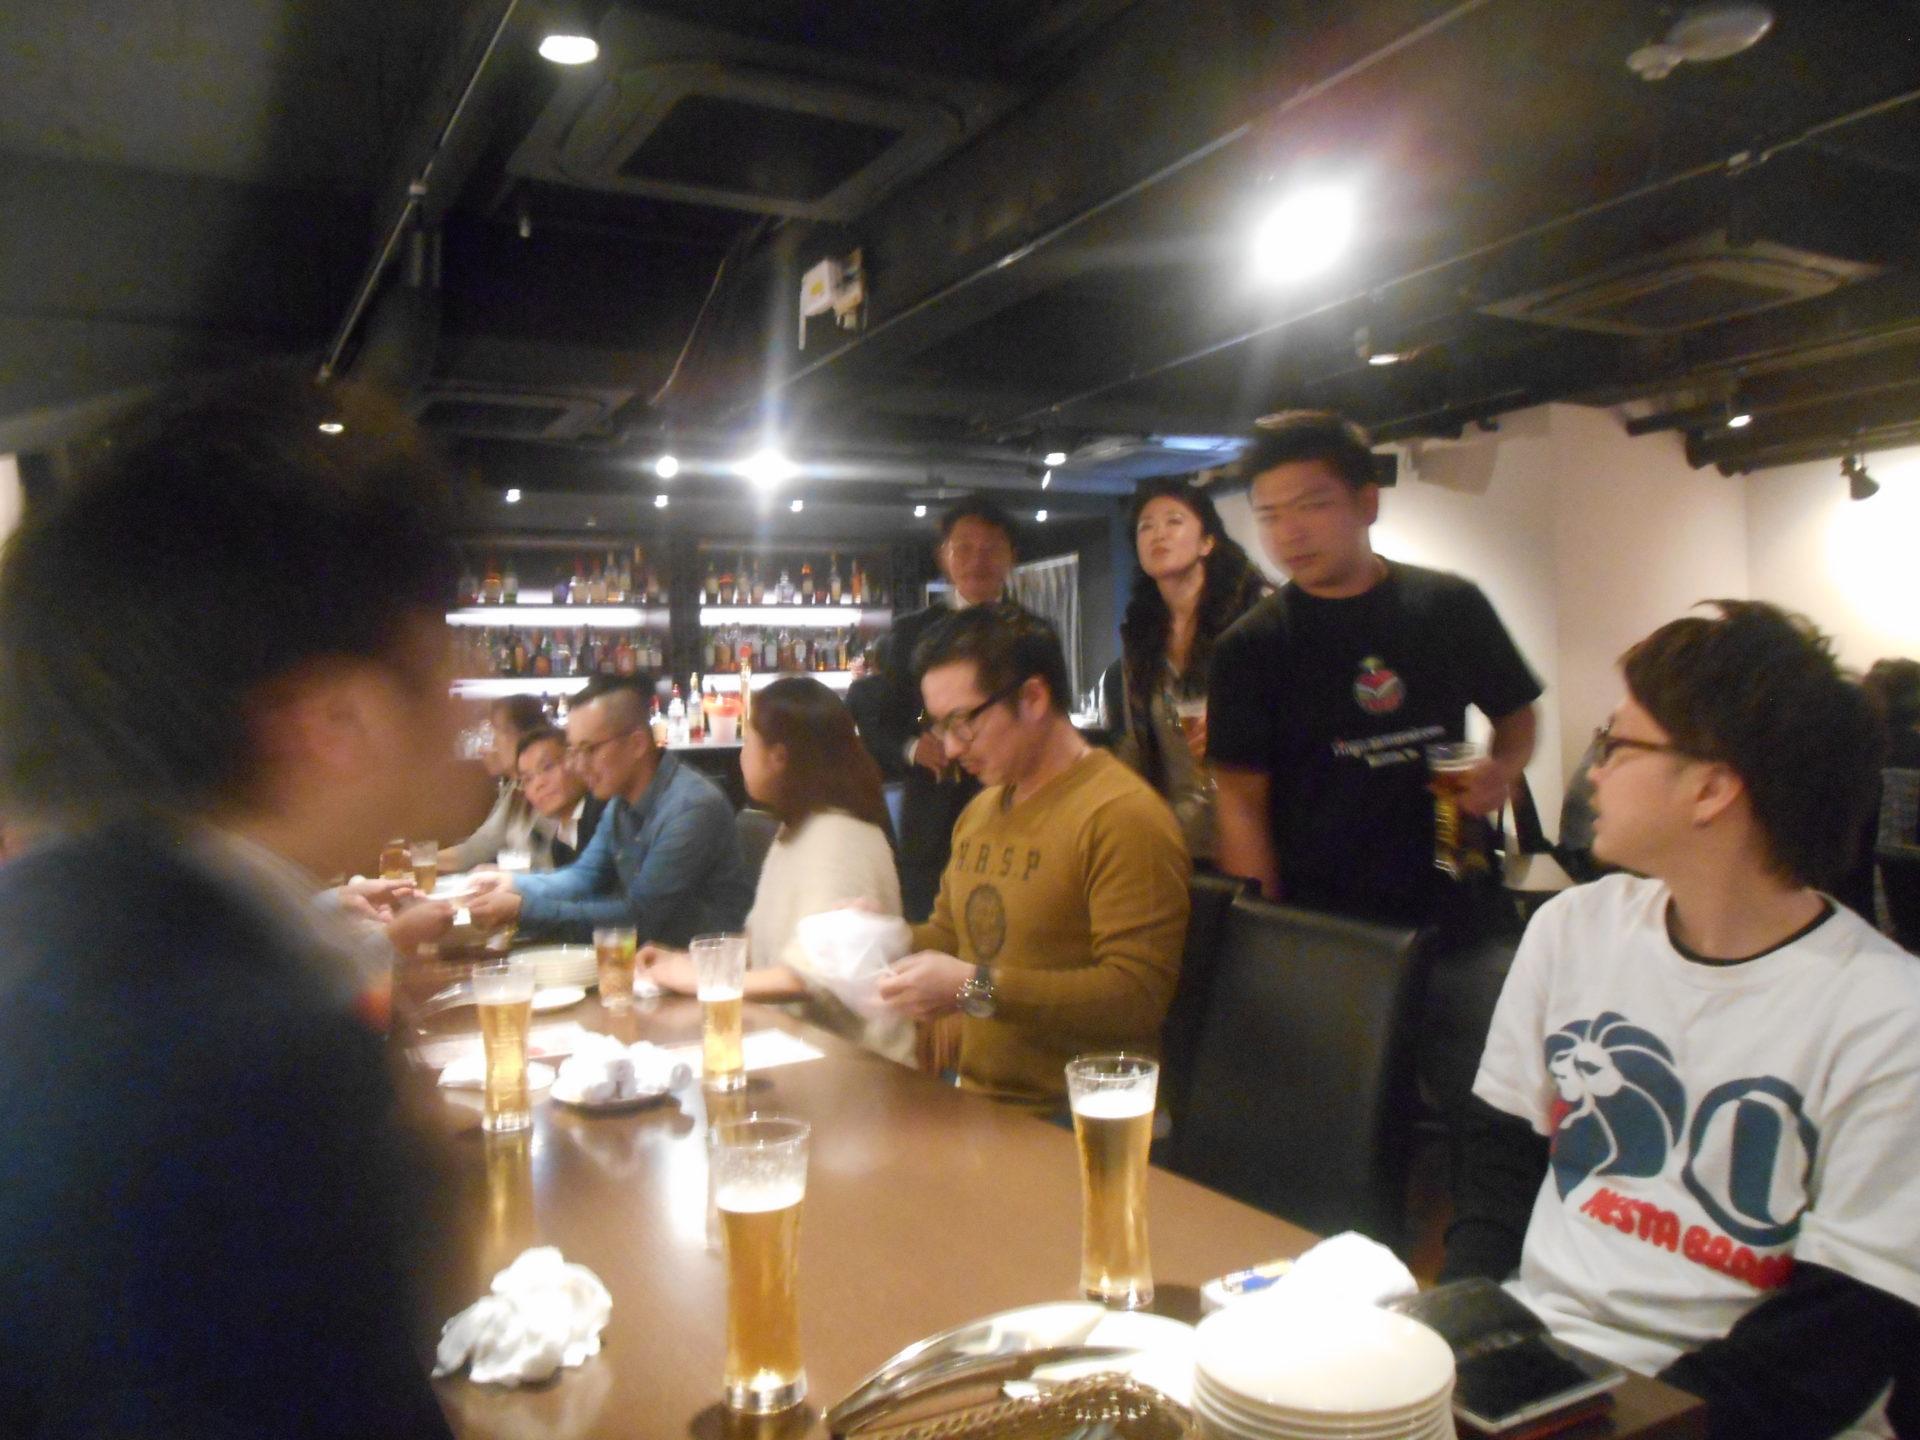 DSCN0297 1920x1440 - 2015年11月16日(月) AOsuki定例飲み会開催致しました。